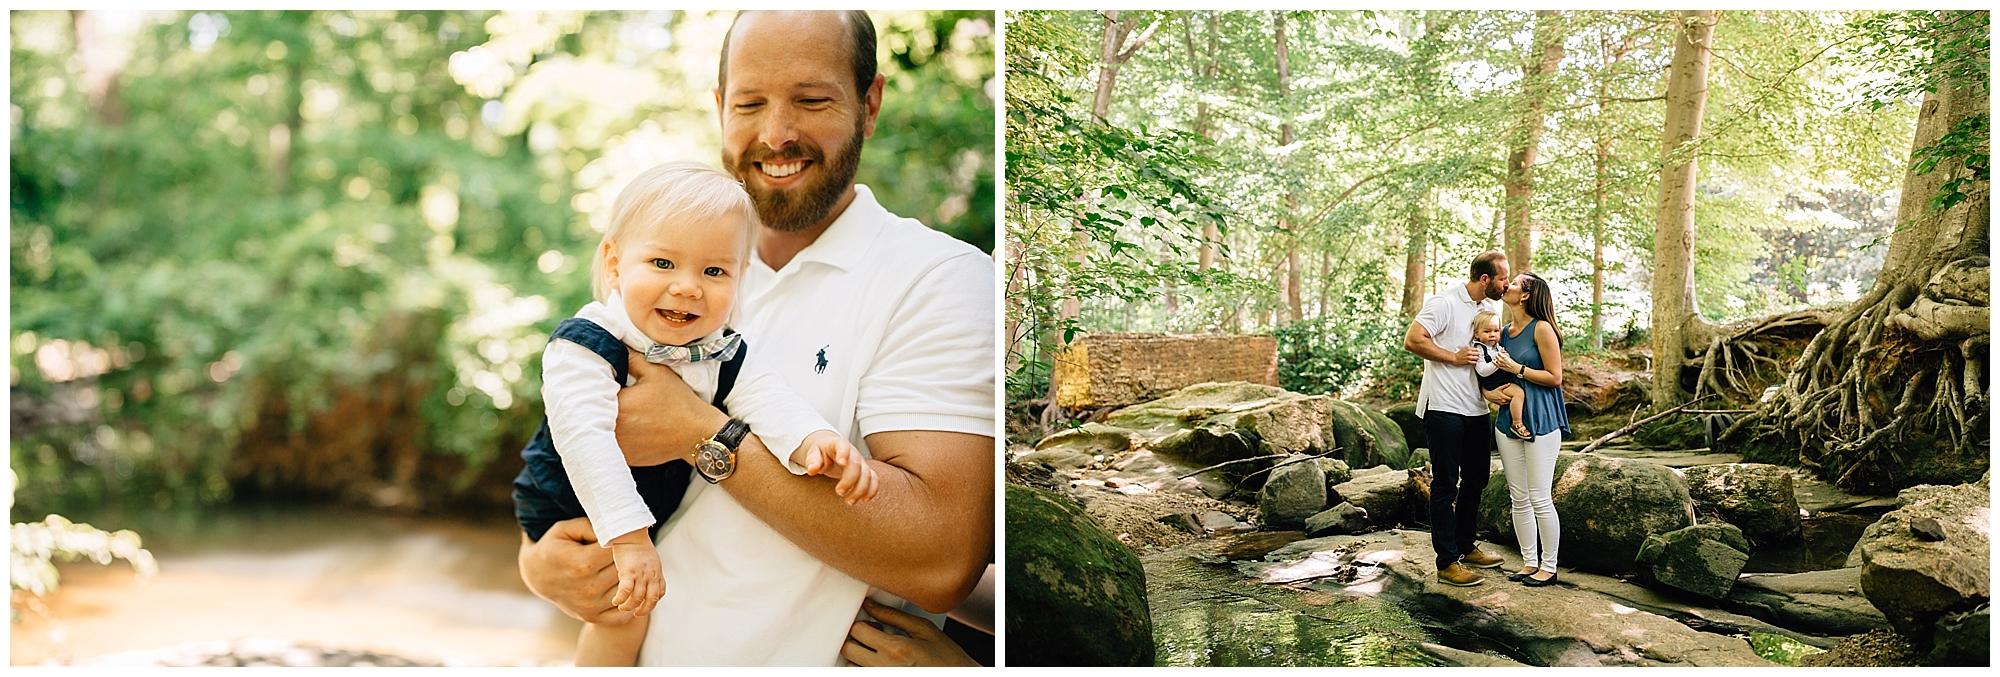 Raleigh-Lifestyle-Family-Photographer-10.jpg